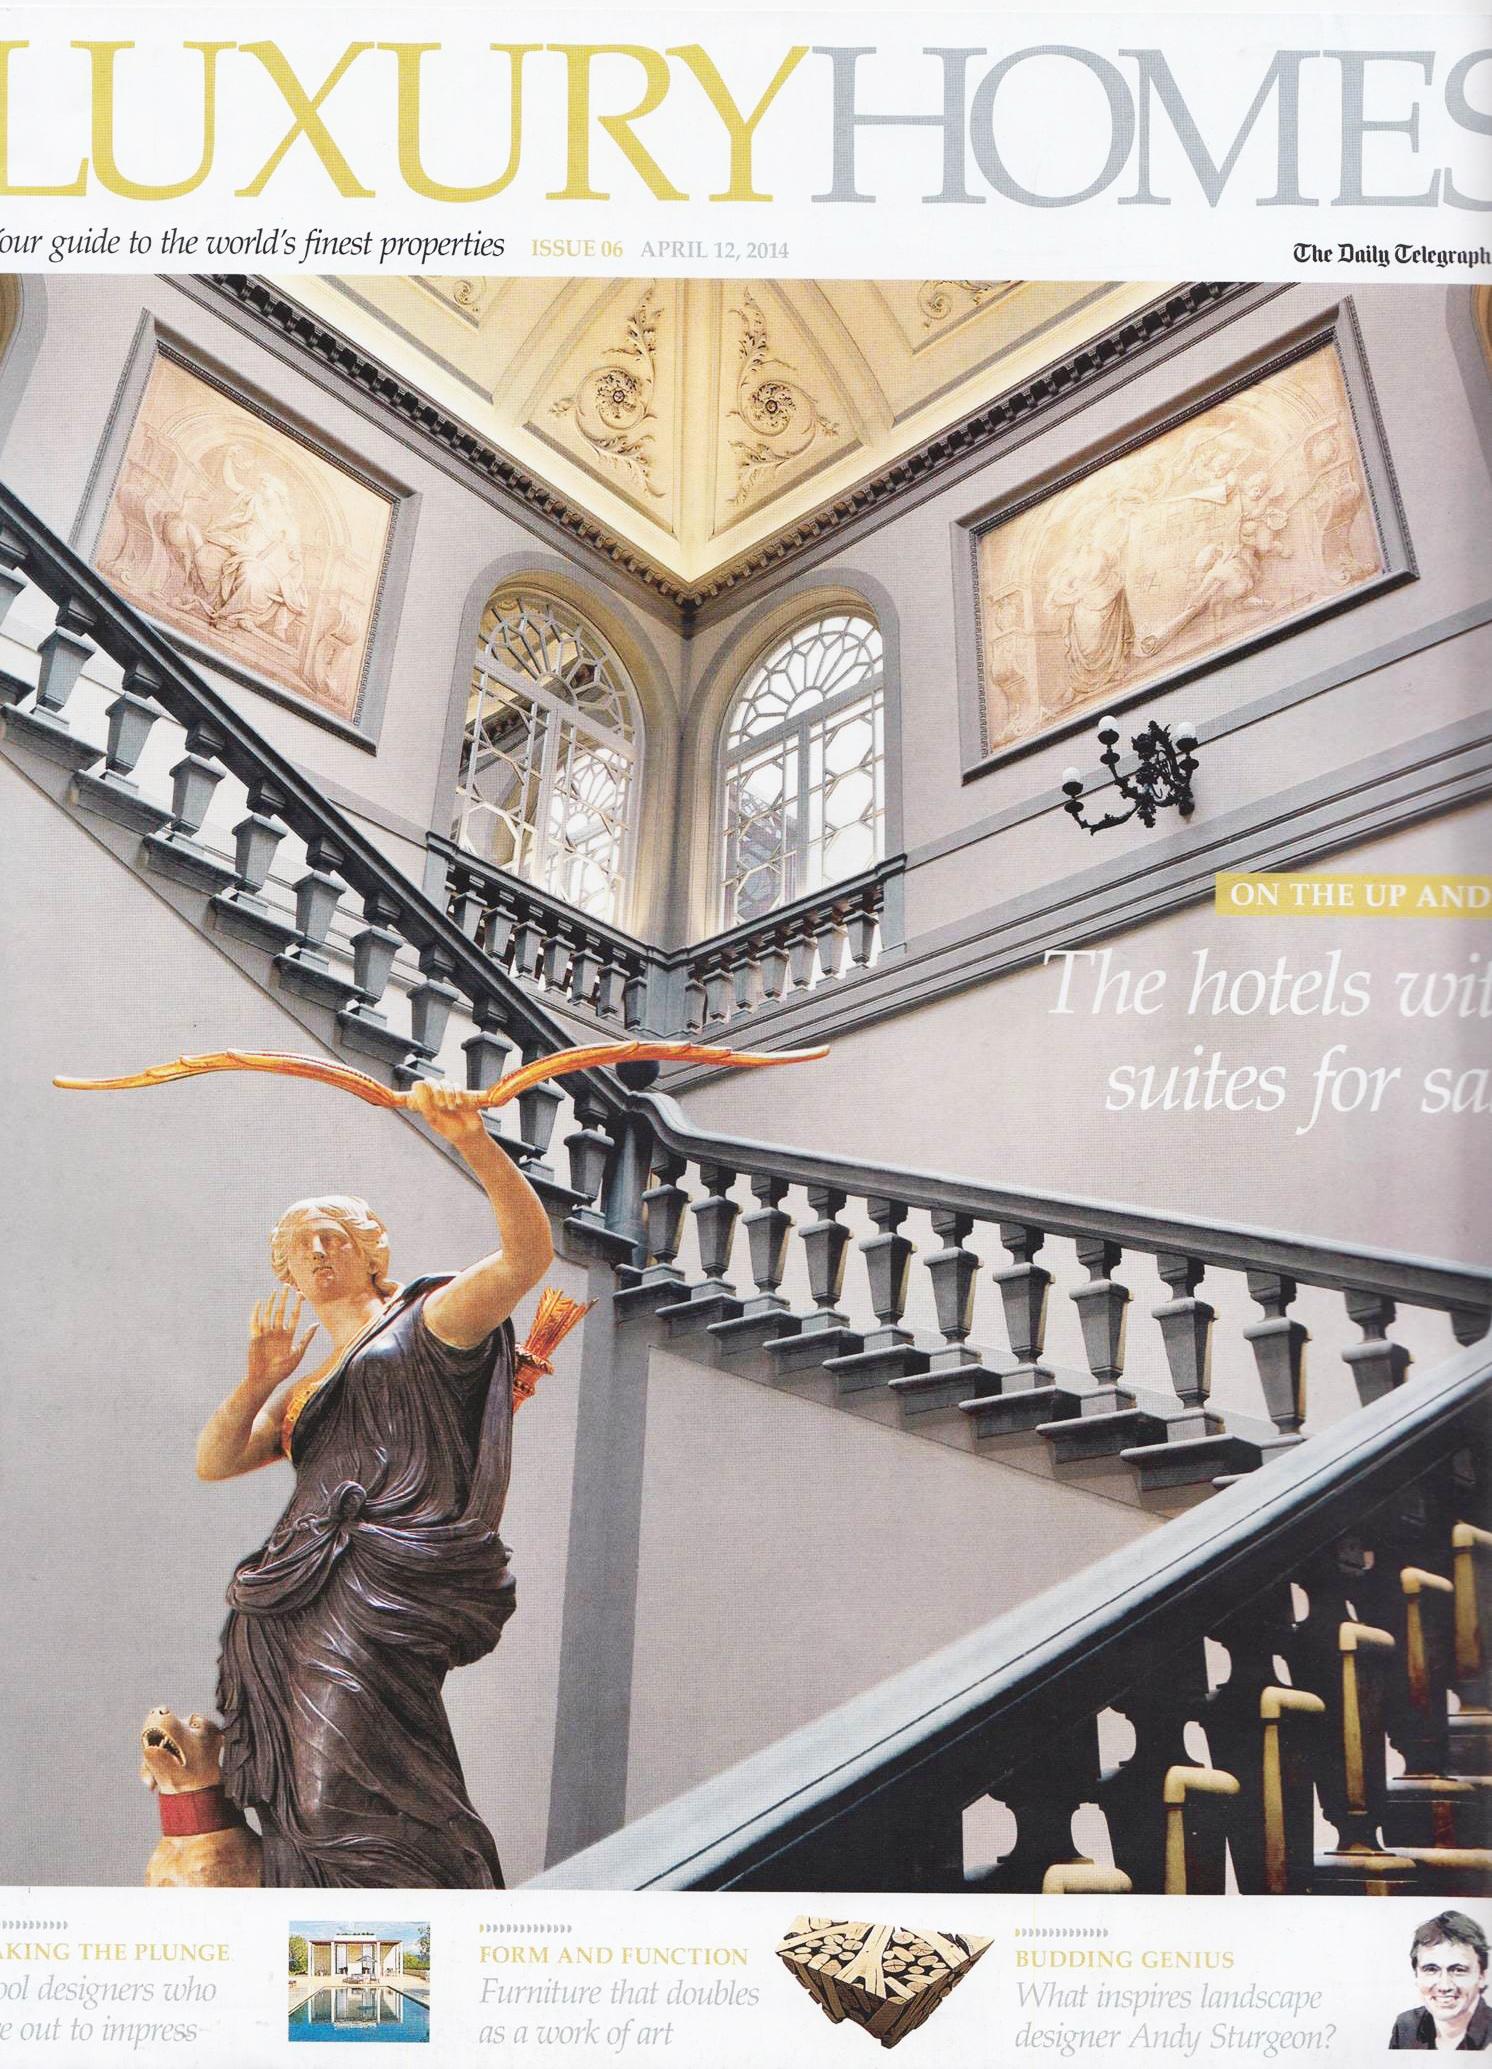 luxury homes april 2014 cover.jpg